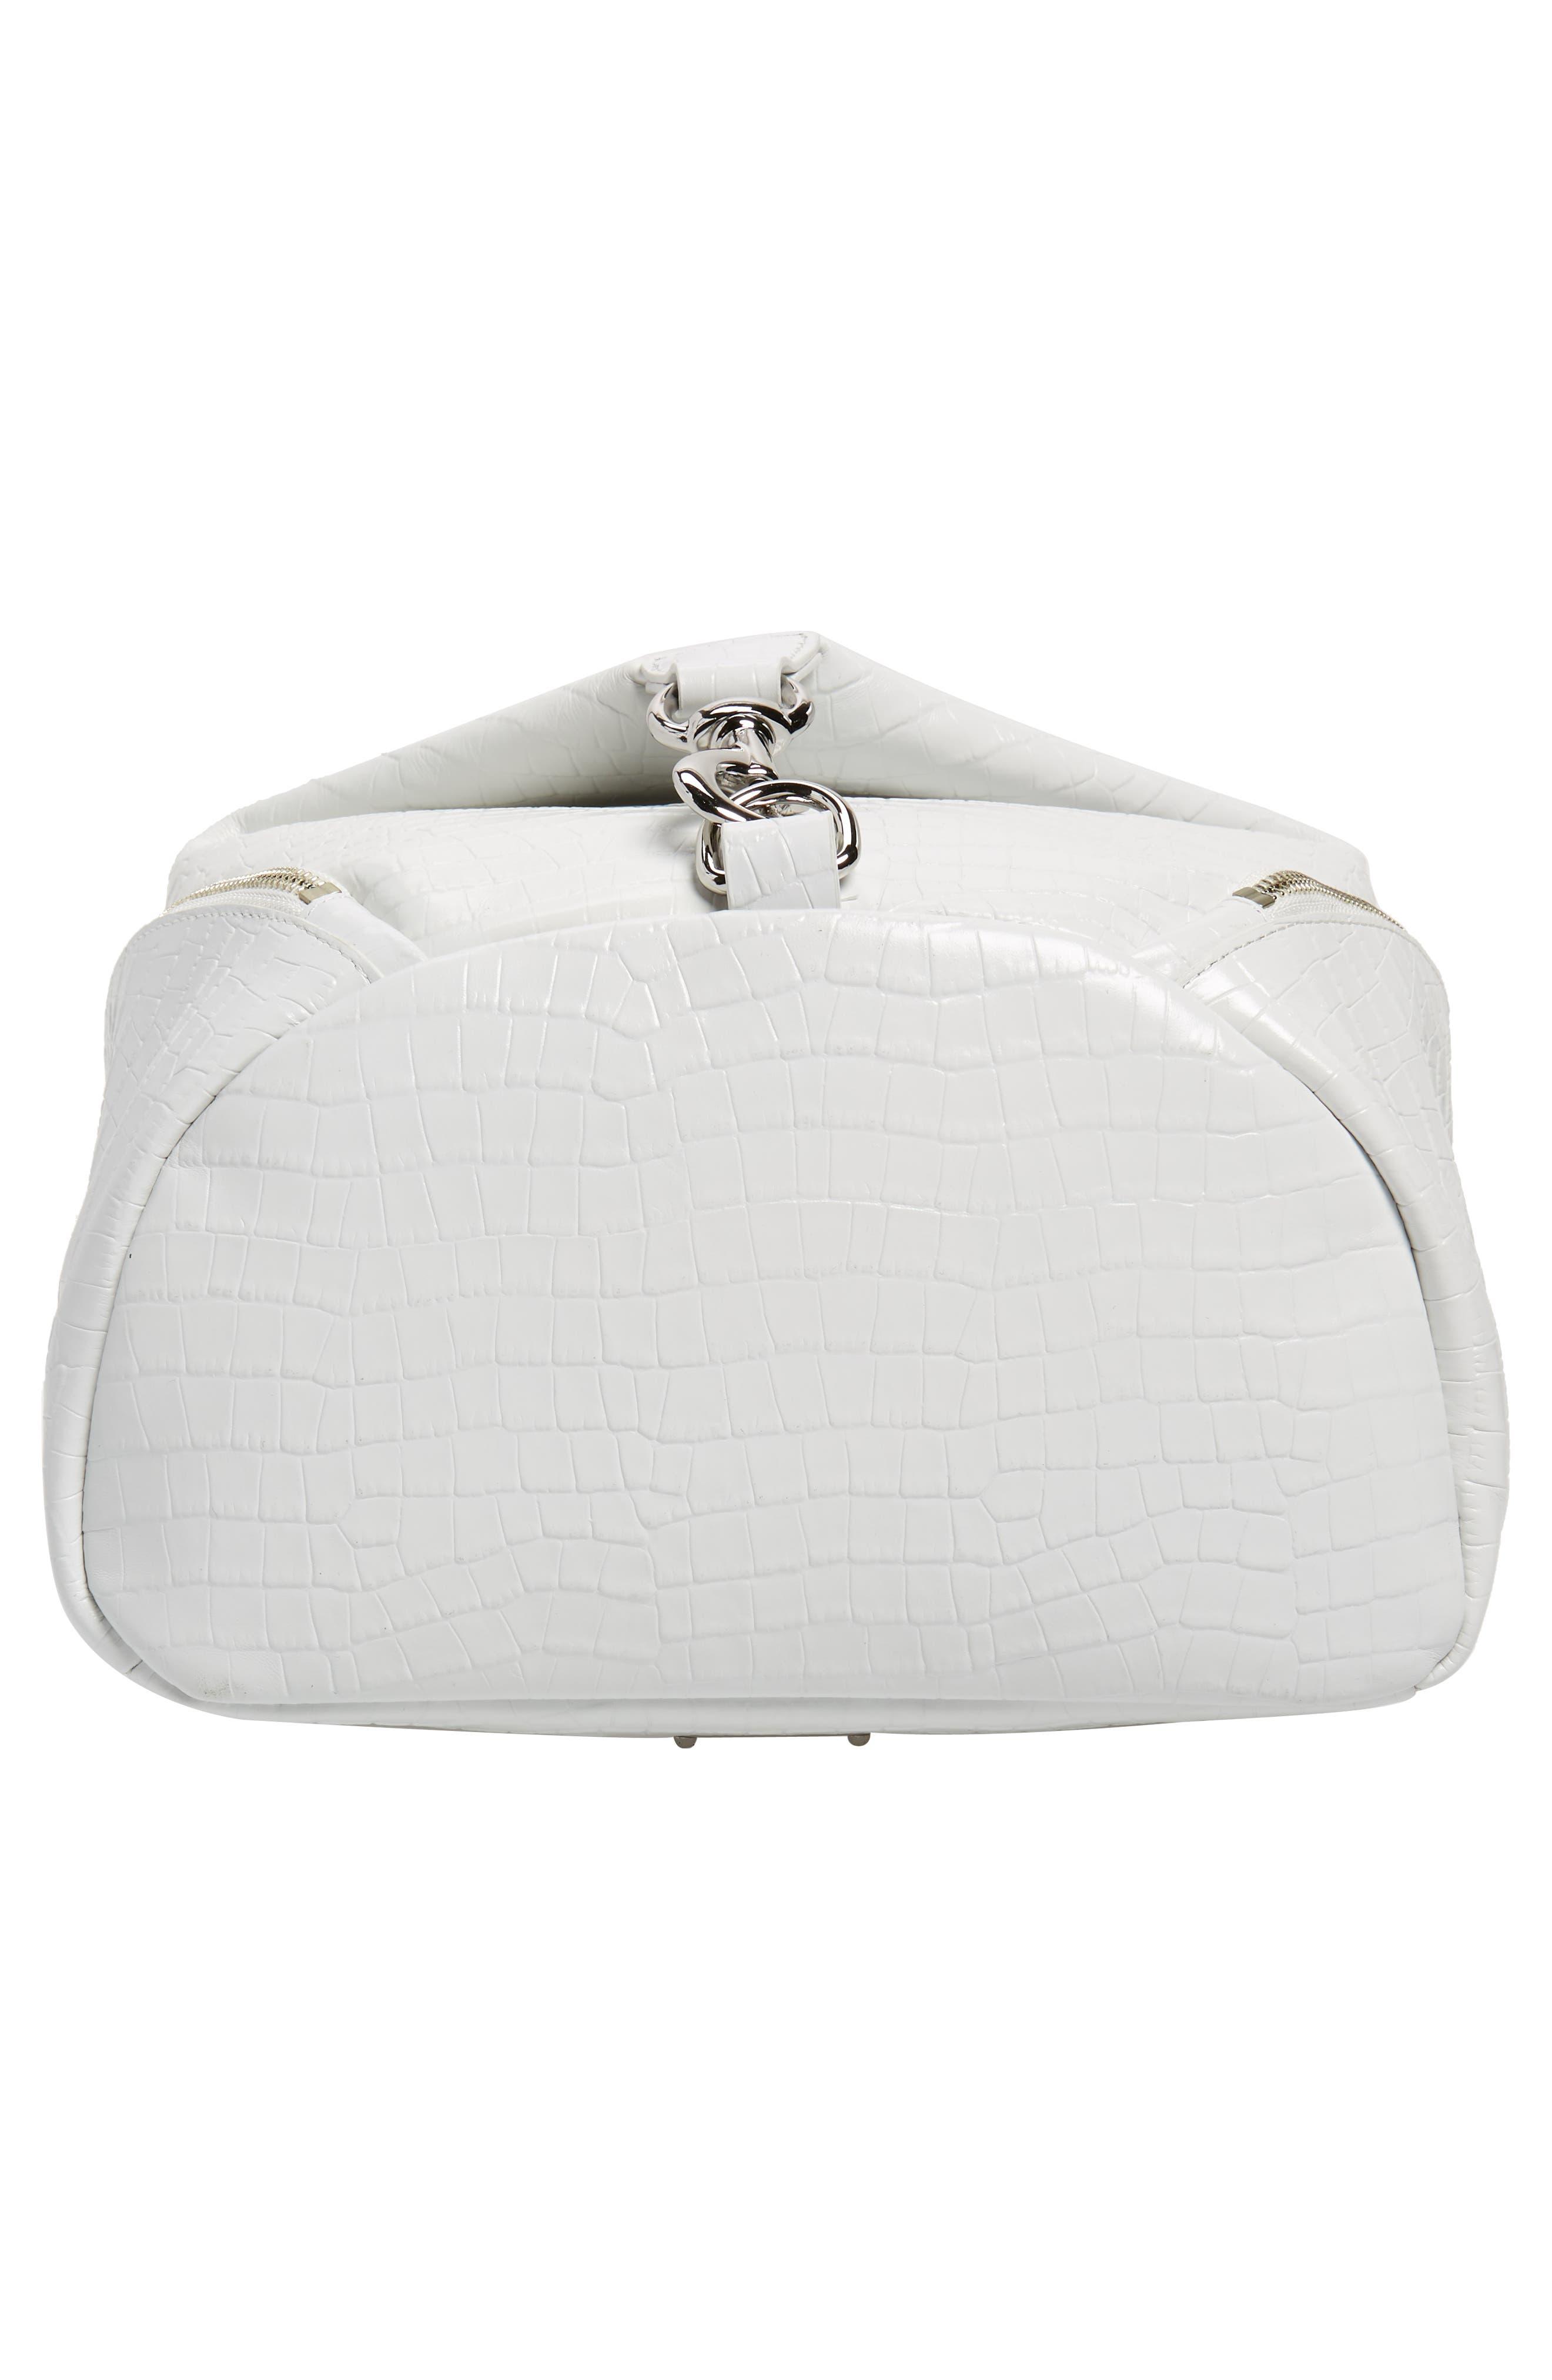 REBECCA MINKOFF, Julian Croc Embossed Leather Backpack, Alternate thumbnail 6, color, OPTIC WHITE